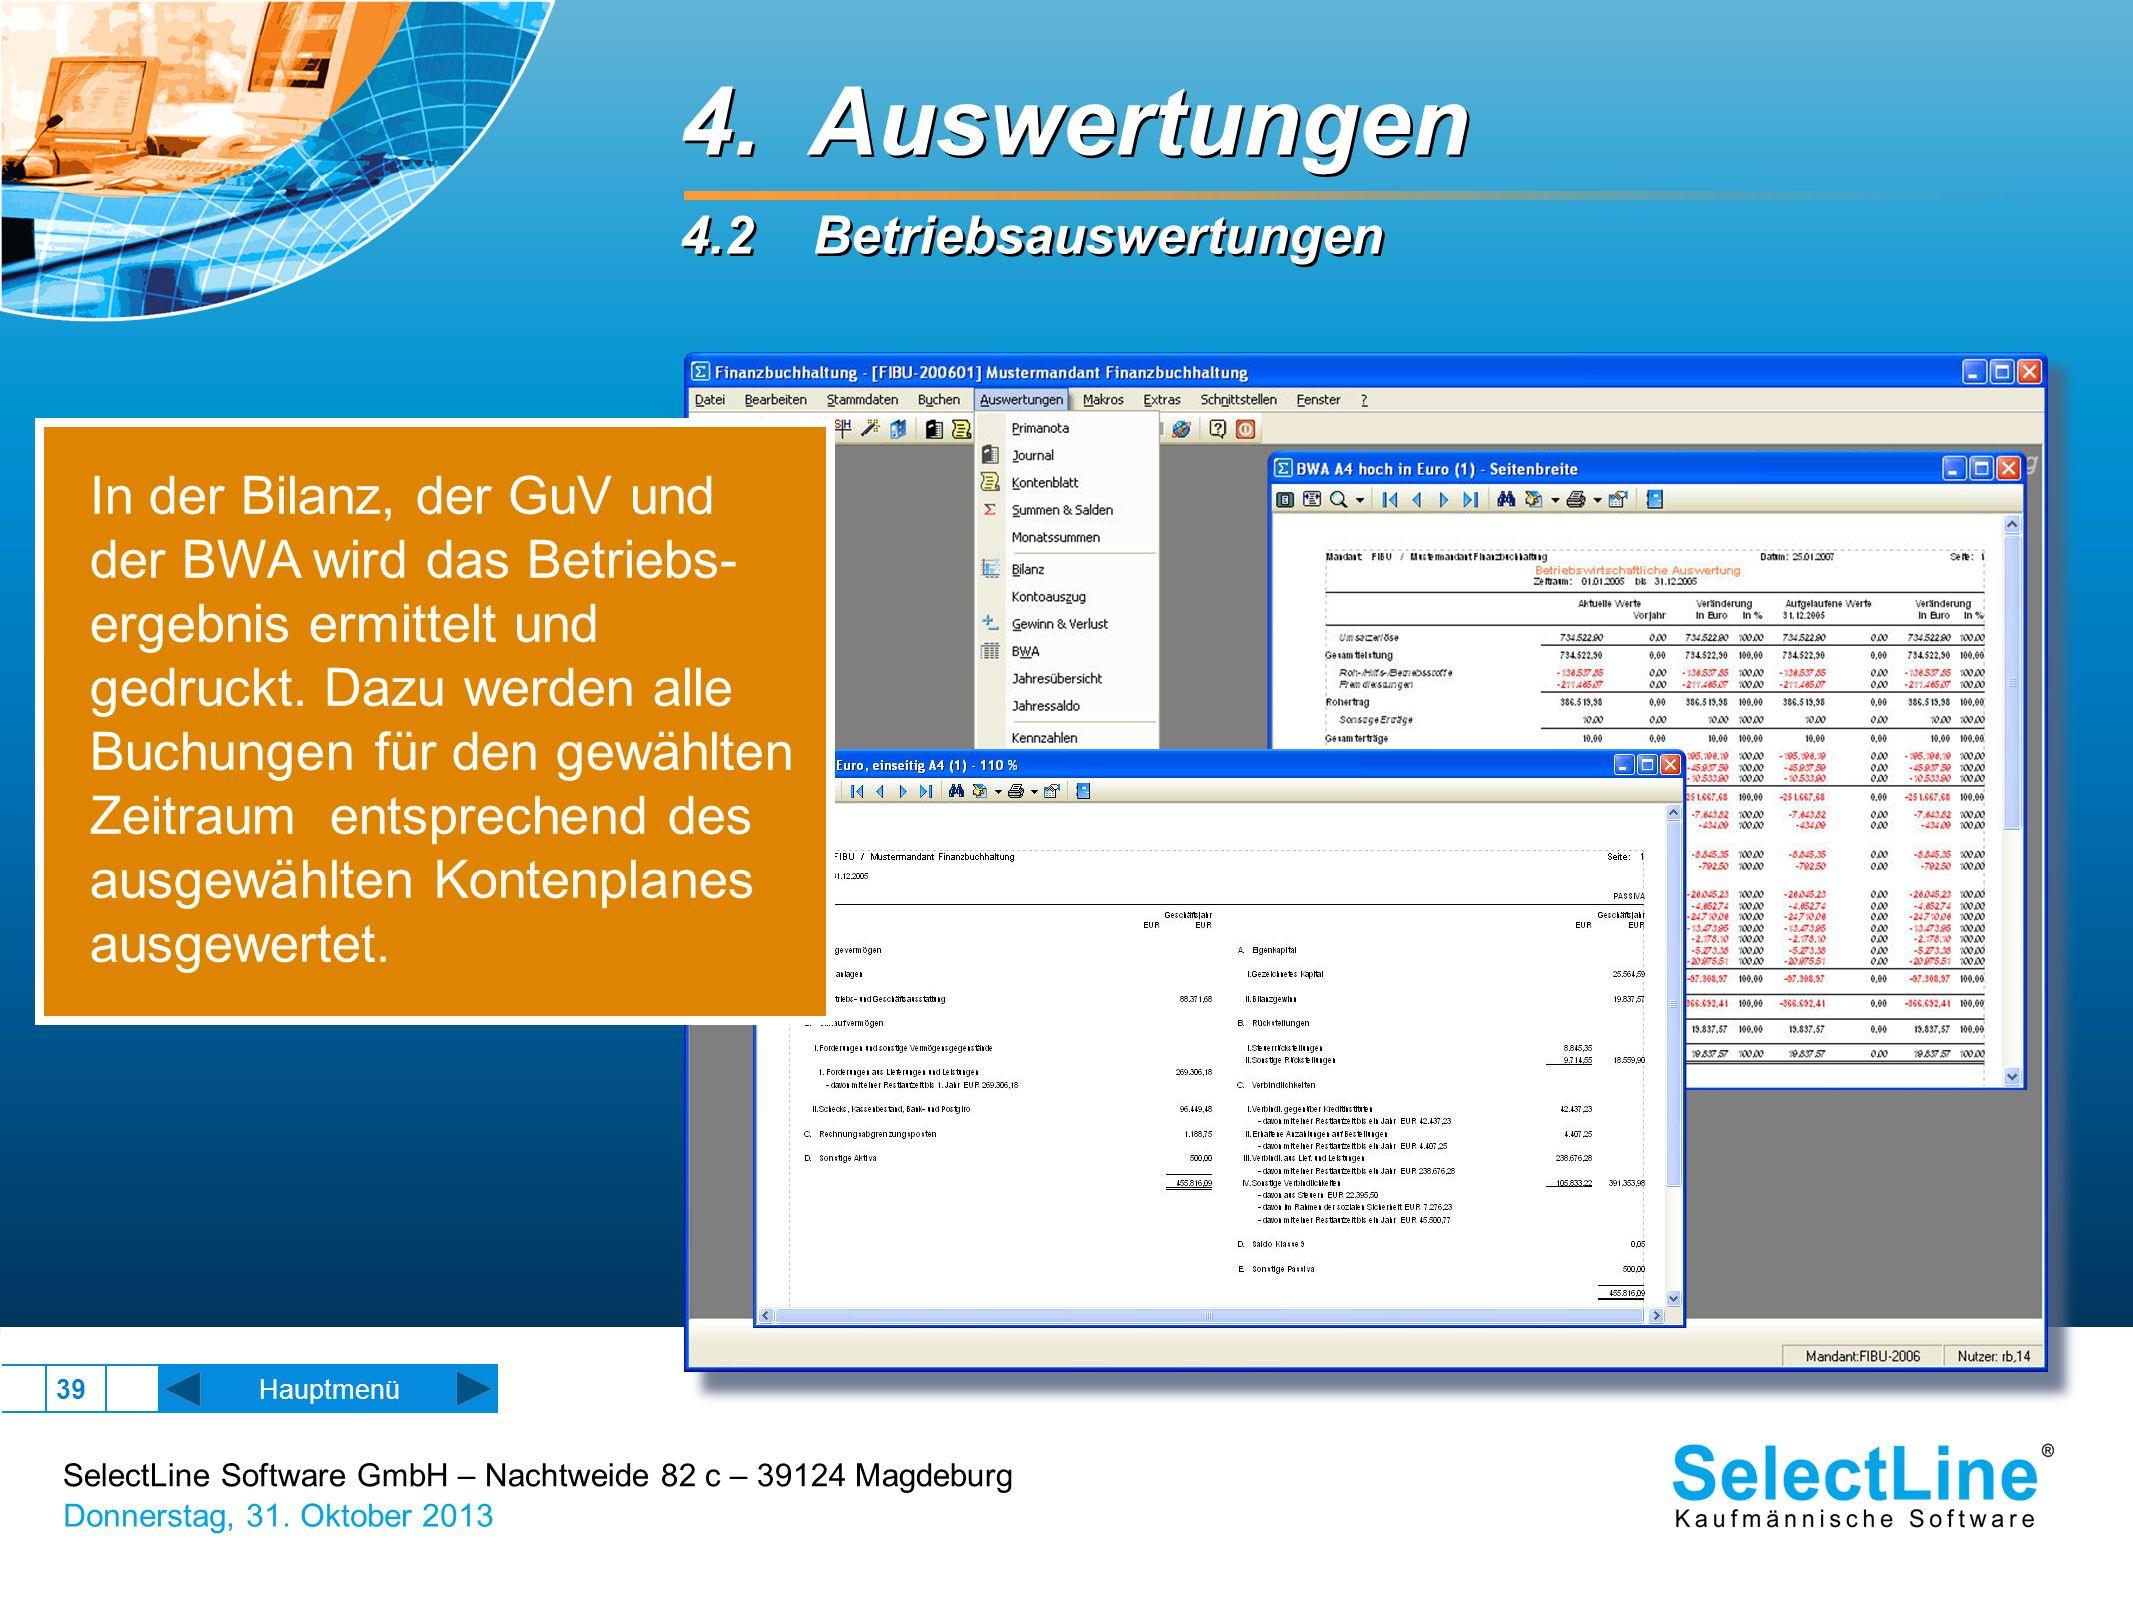 4. Auswertungen 4.2 Betriebsauswertungen